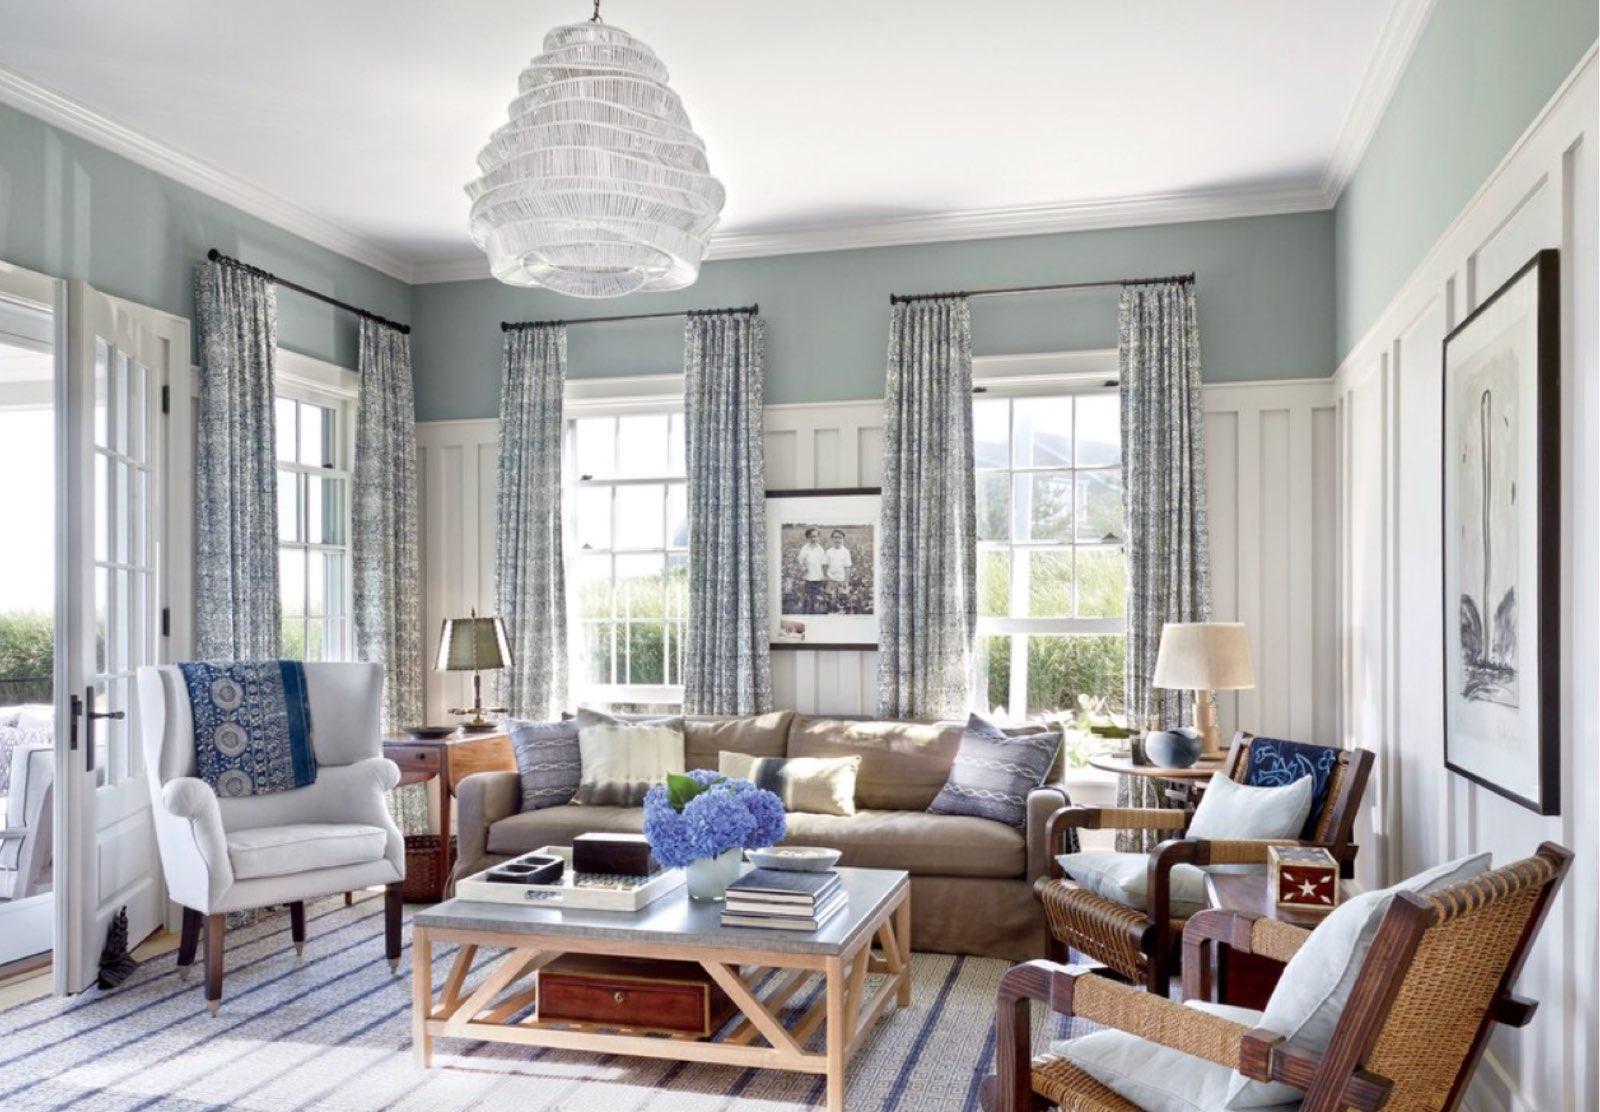 Victoria Hagen's Classic Nantucket Home Photos | Architectural Digest-5.jpg